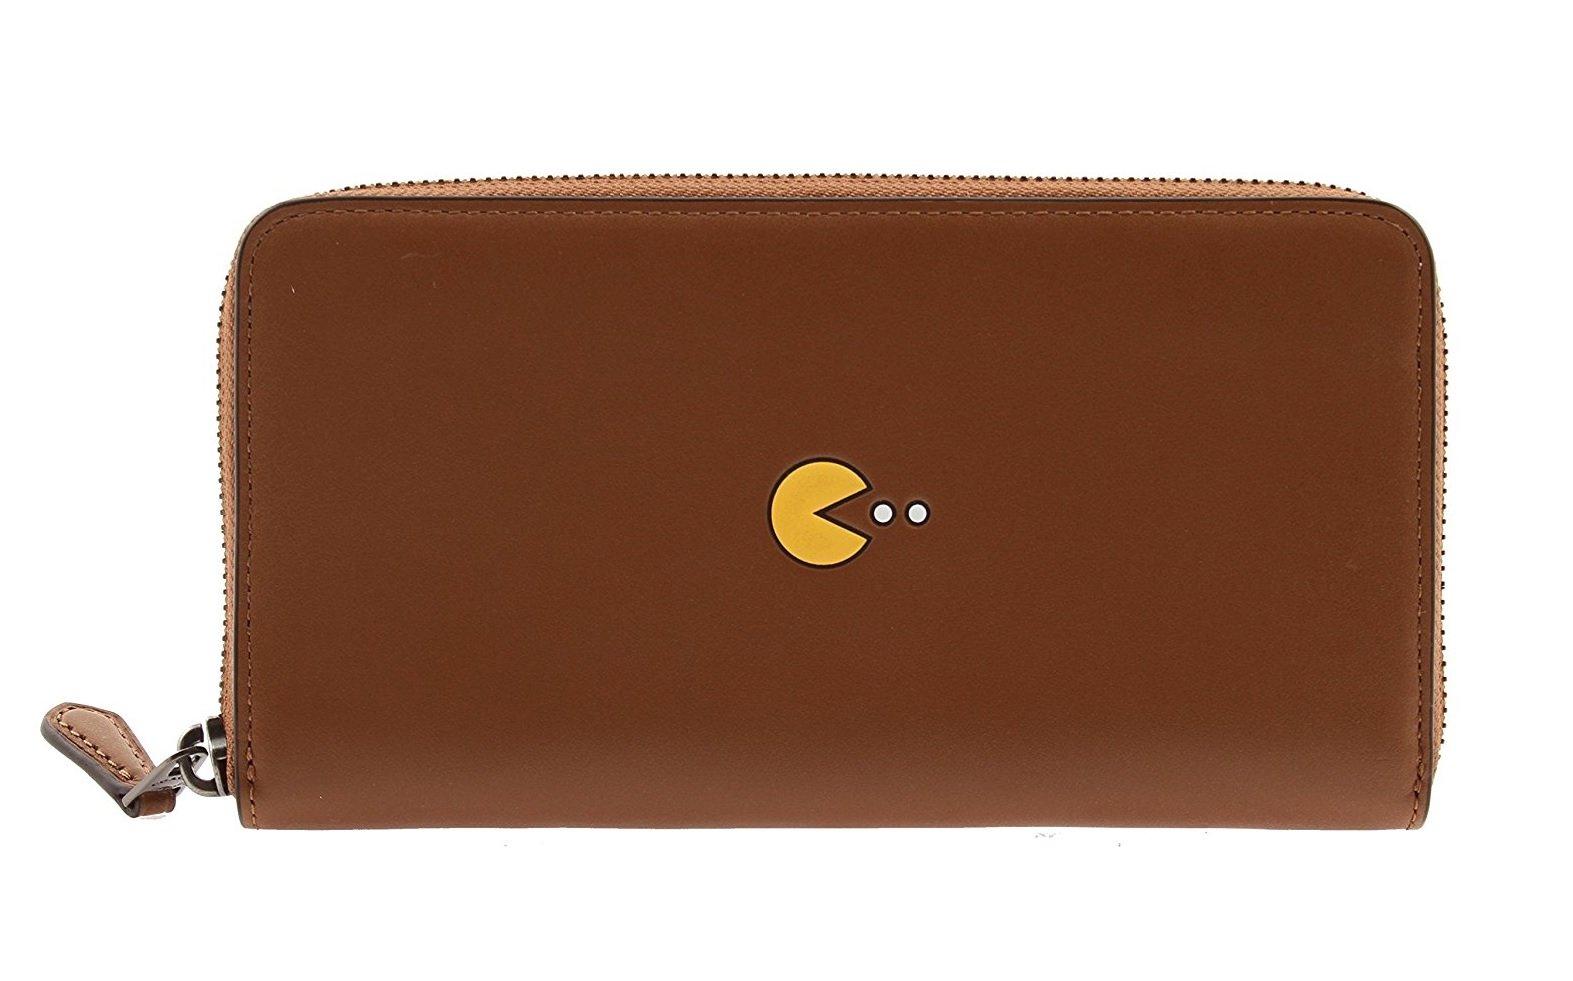 Coach PAC-MAN Calf Leather Accordion Wallet, F55736 (Saddle)